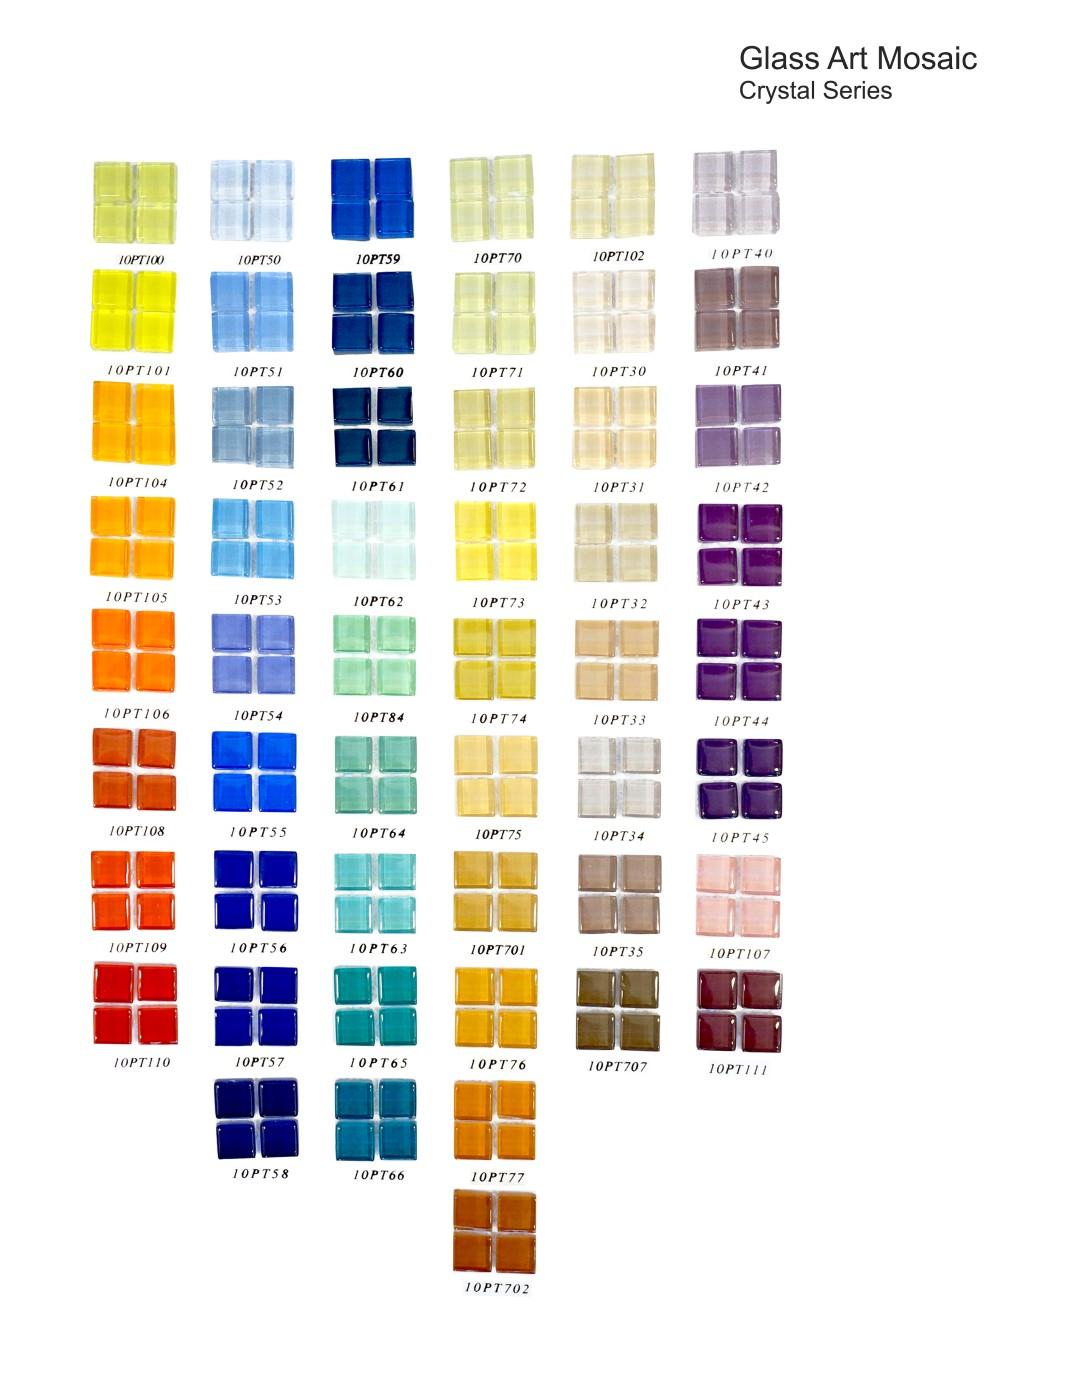 Glass Art Mosaic Crystal 1 Series (Large).jpg